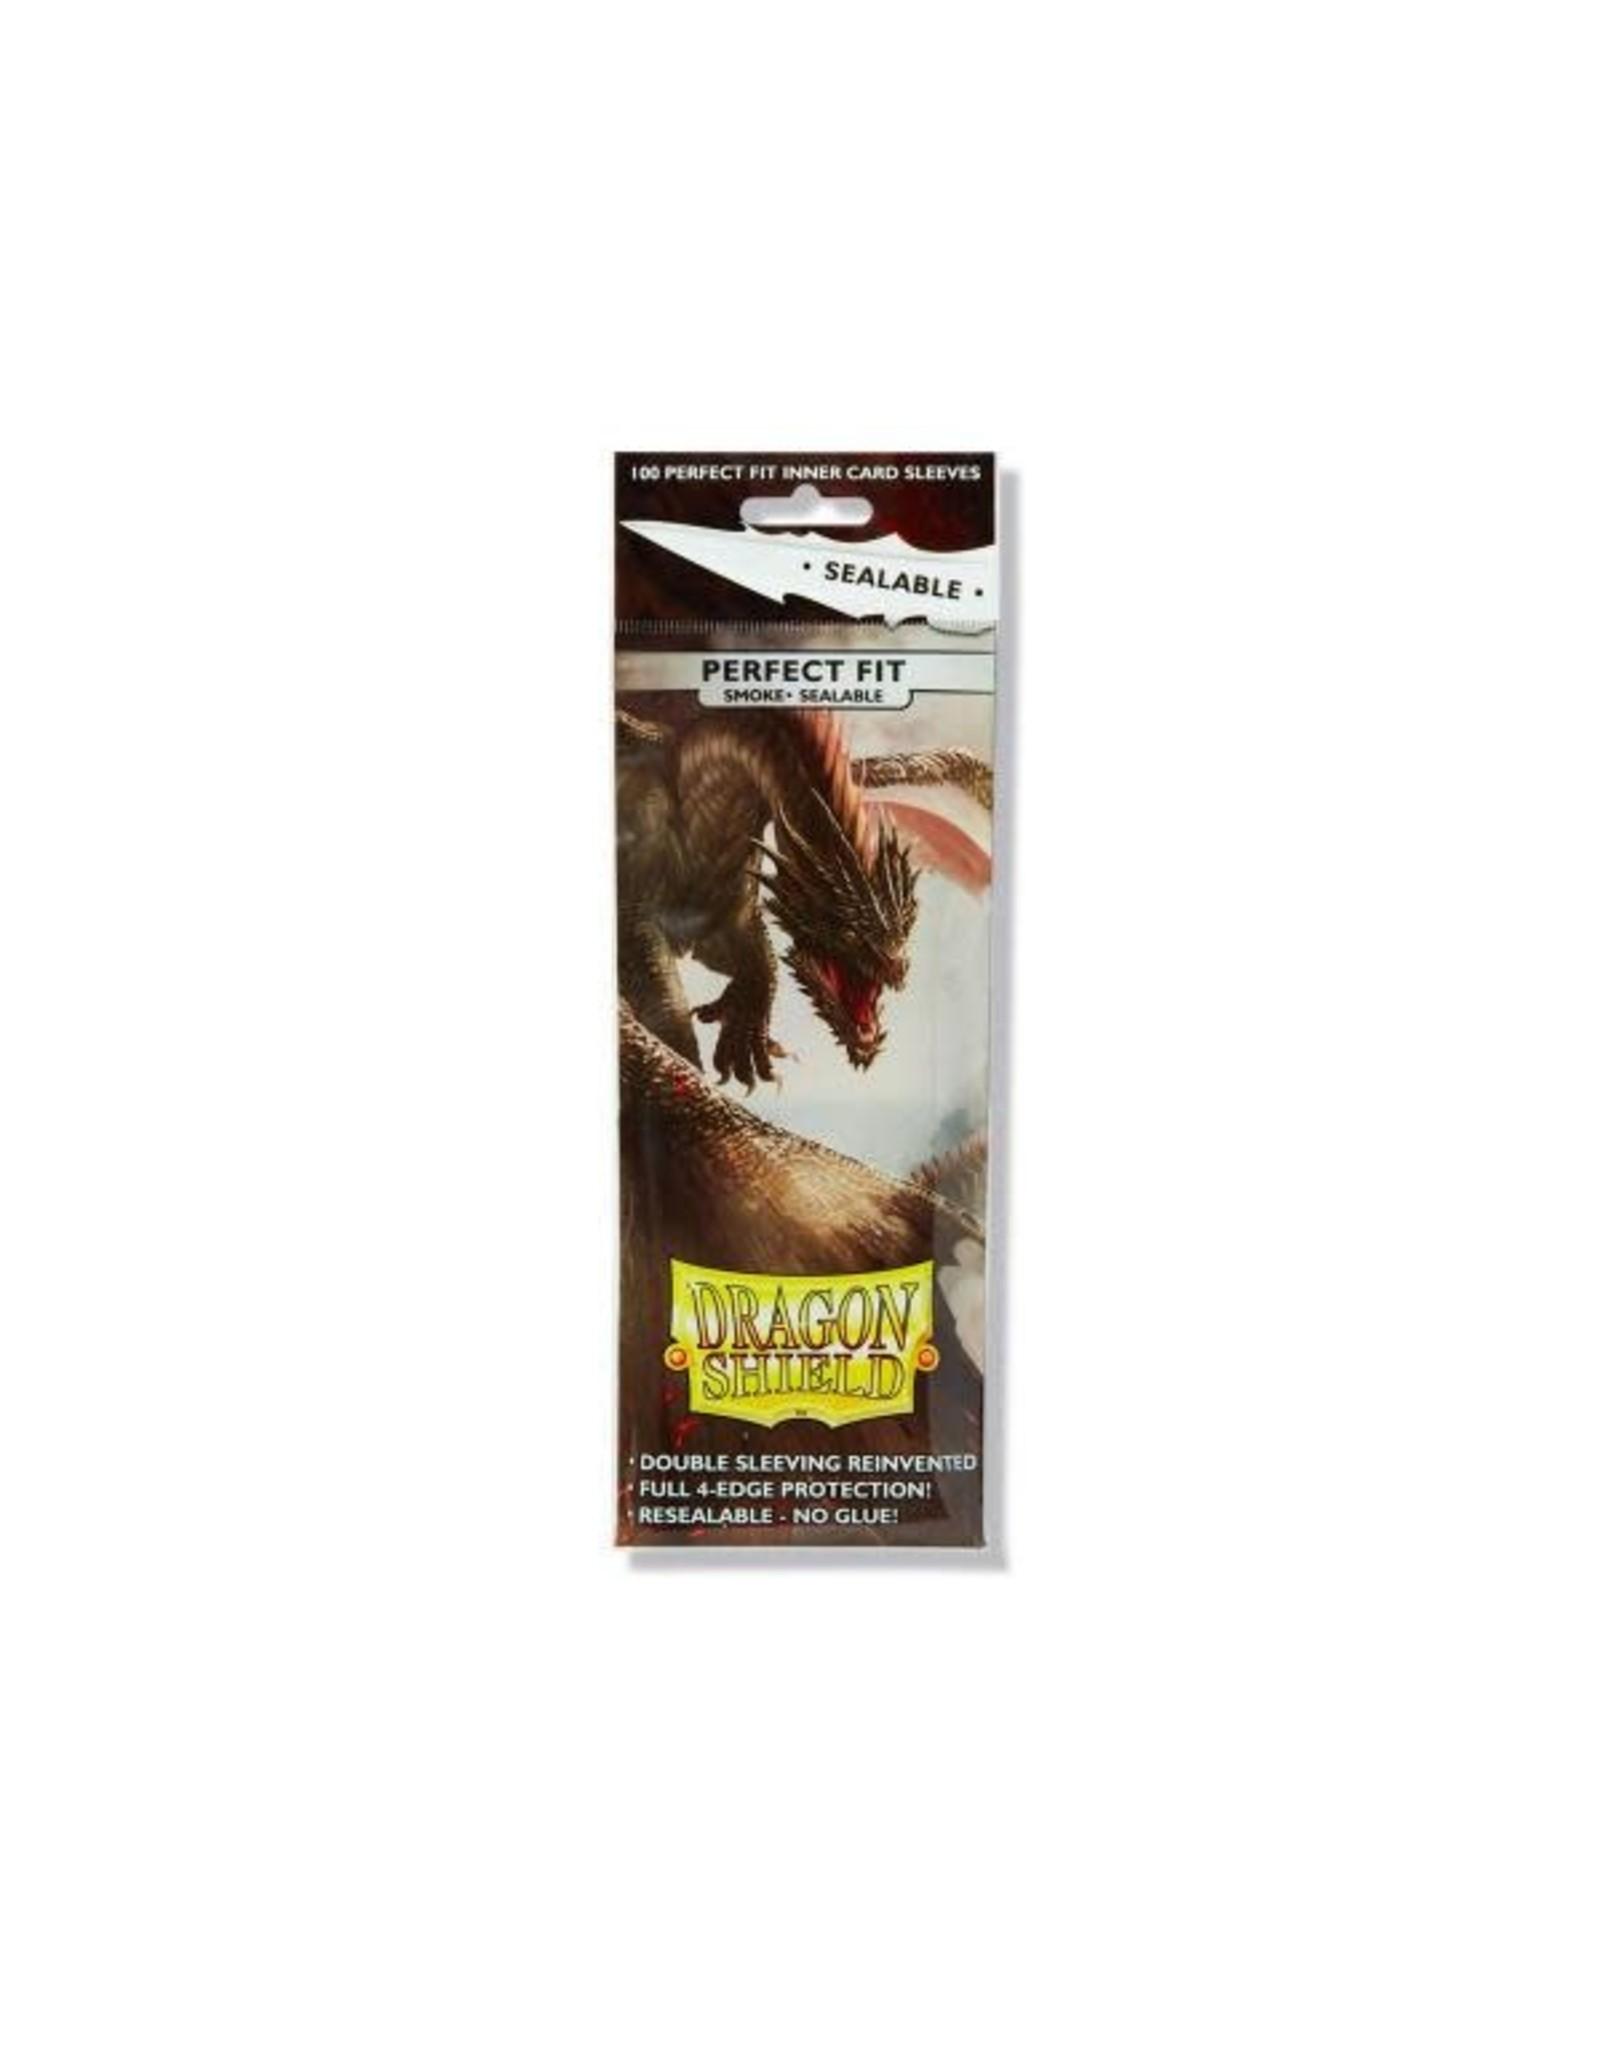 Dragon Shield Sleeves: Perfect Fit Sealable - Smoke